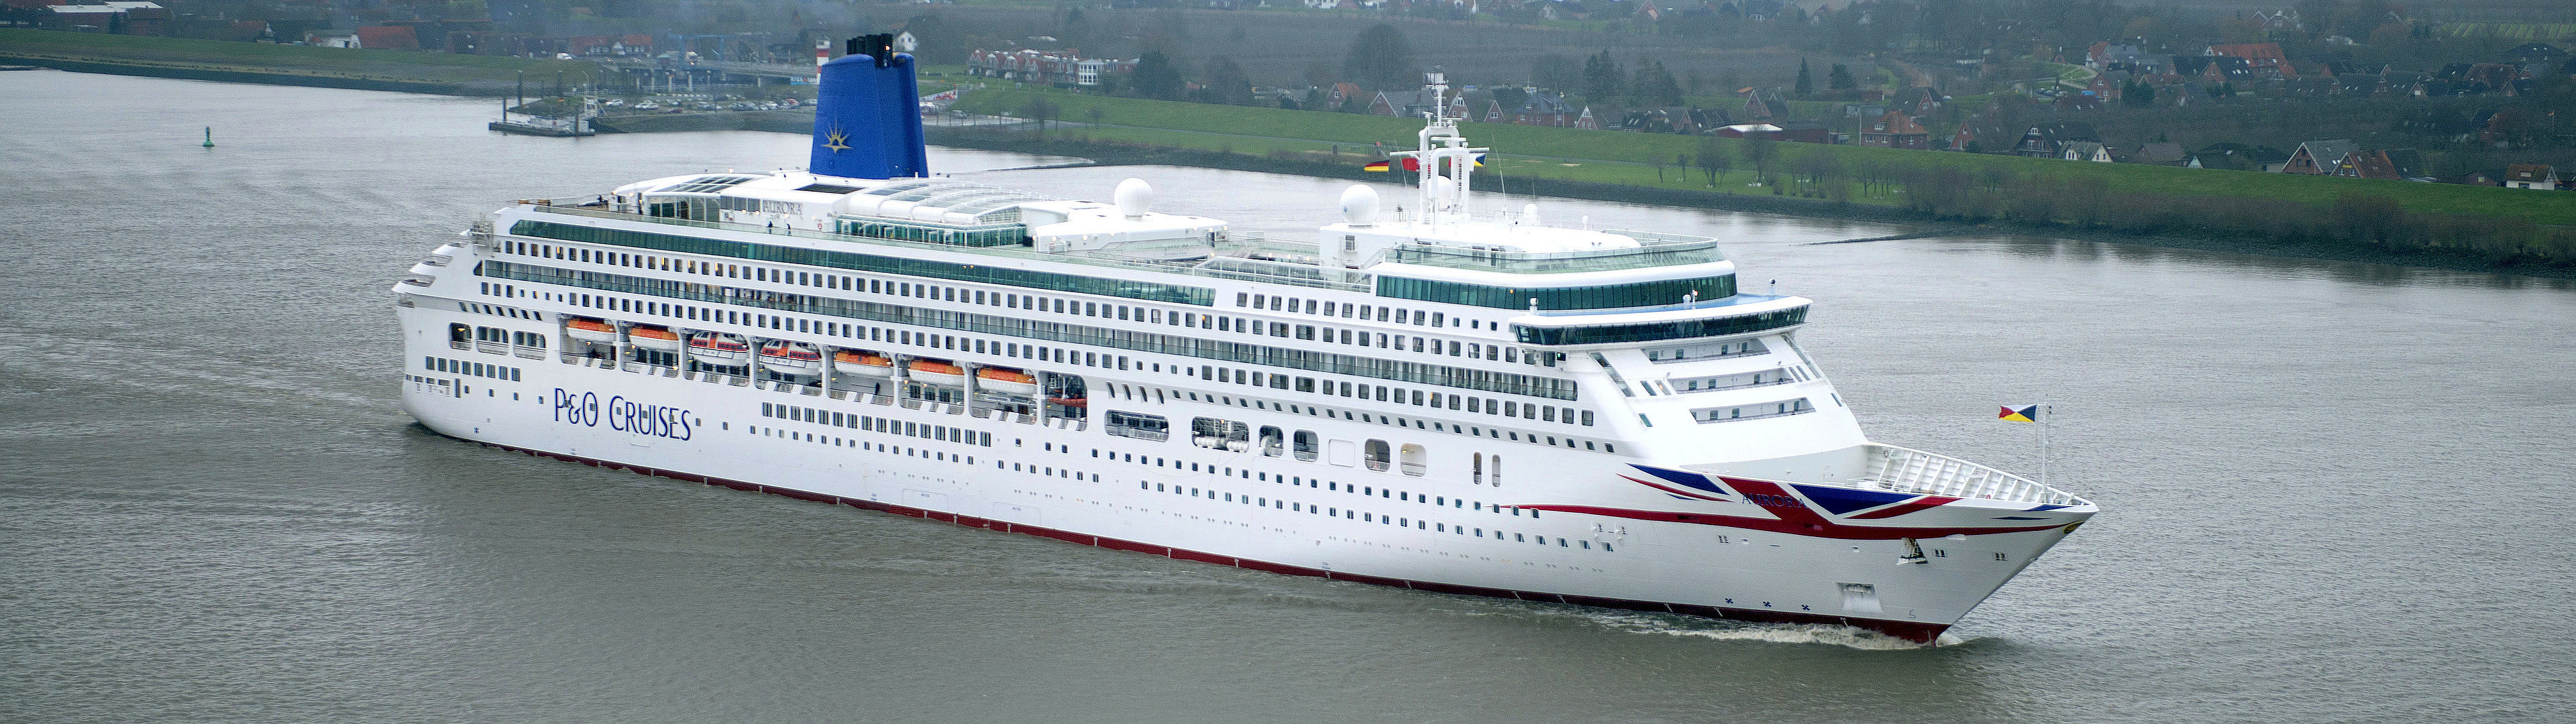 P&O Cruises Aurora.jpg